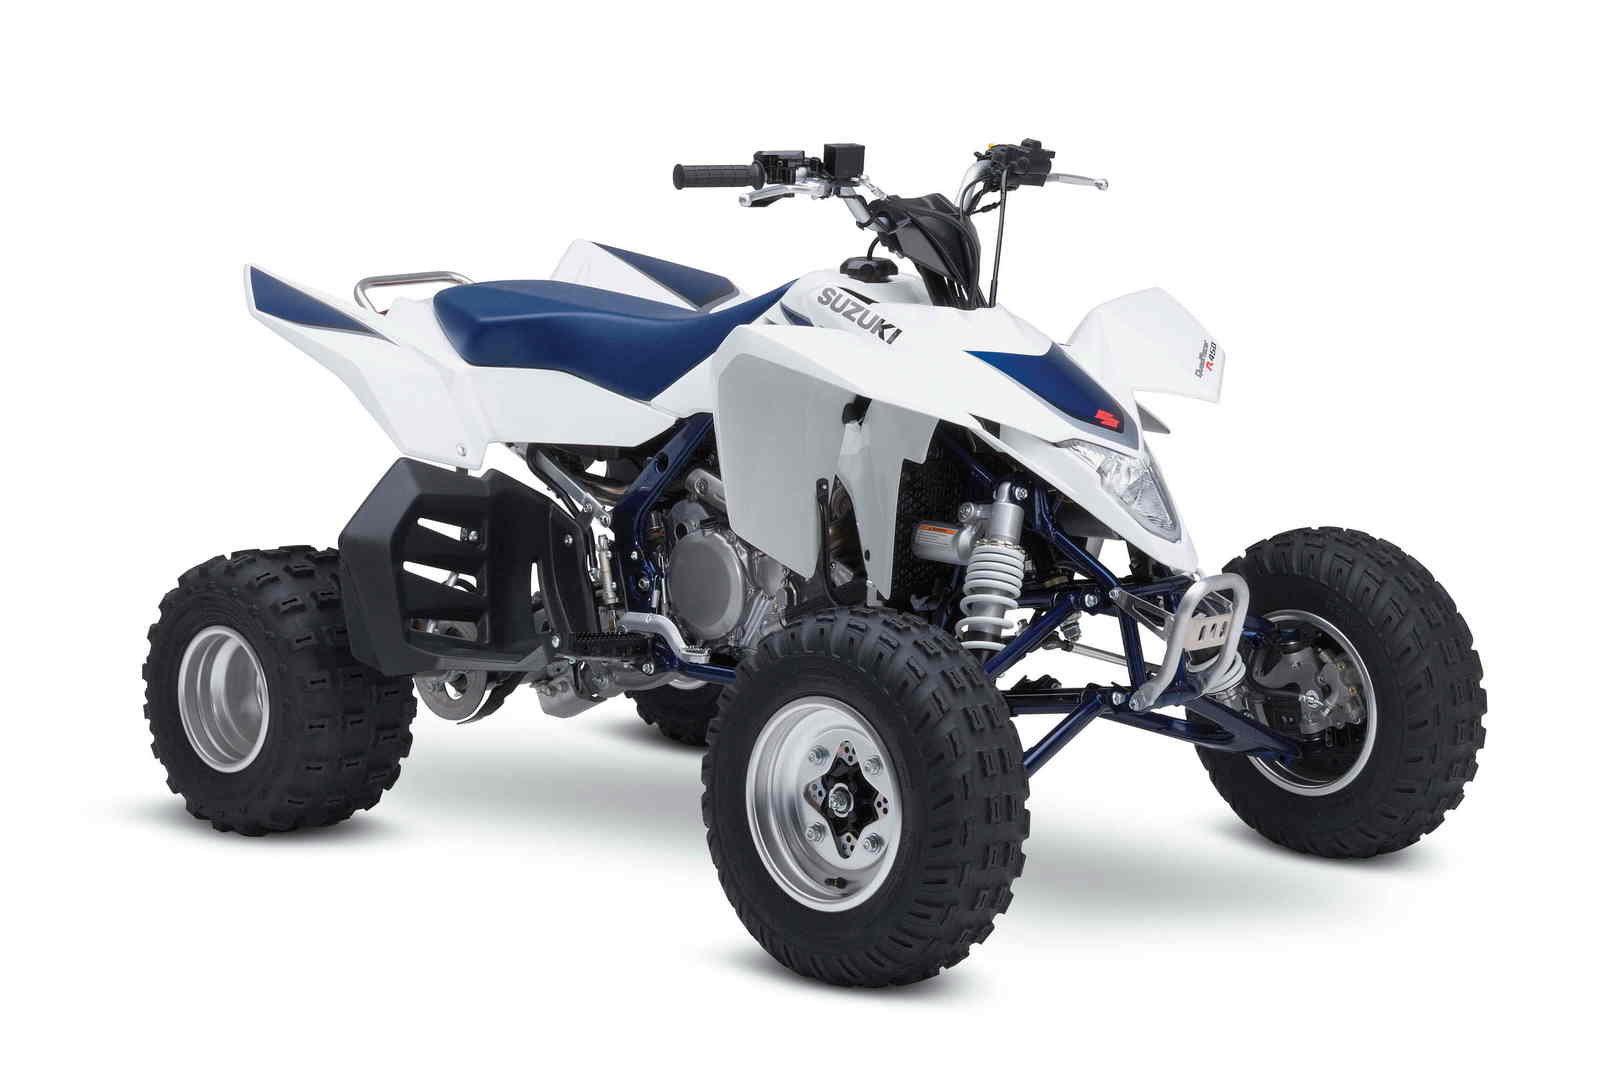 Suzuki Ltr Quadracer Specs